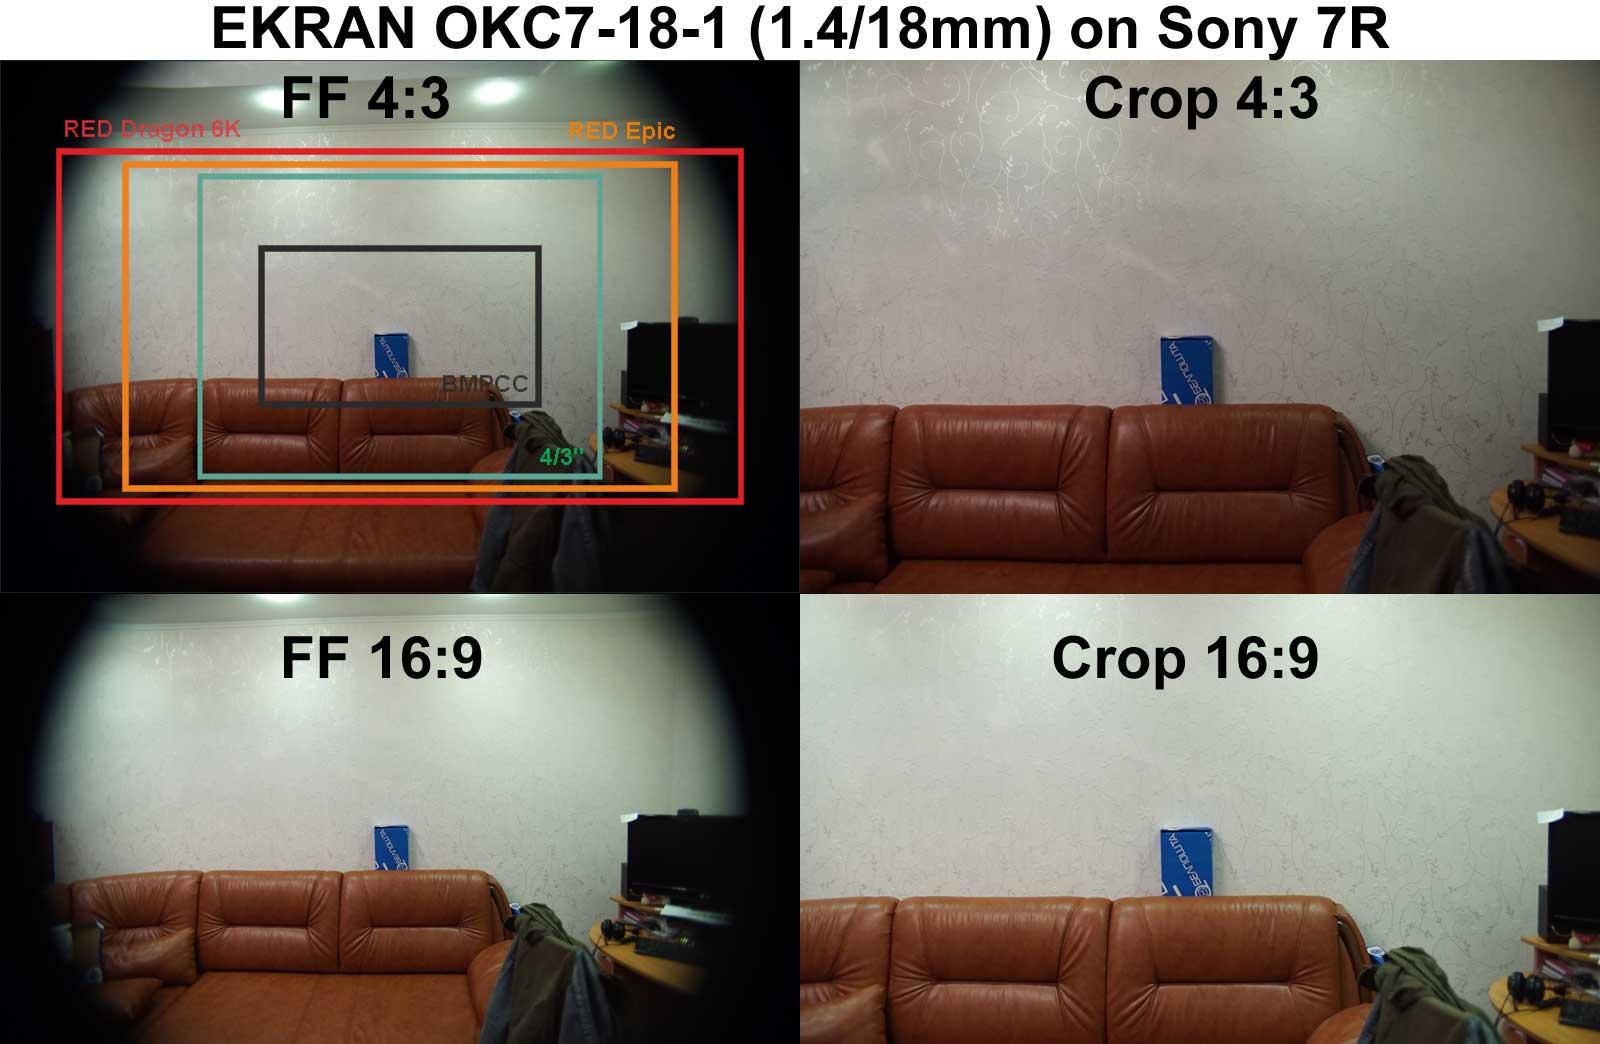 Coverage of LOMO OKC7-18-1 lens on Sony 7R camera